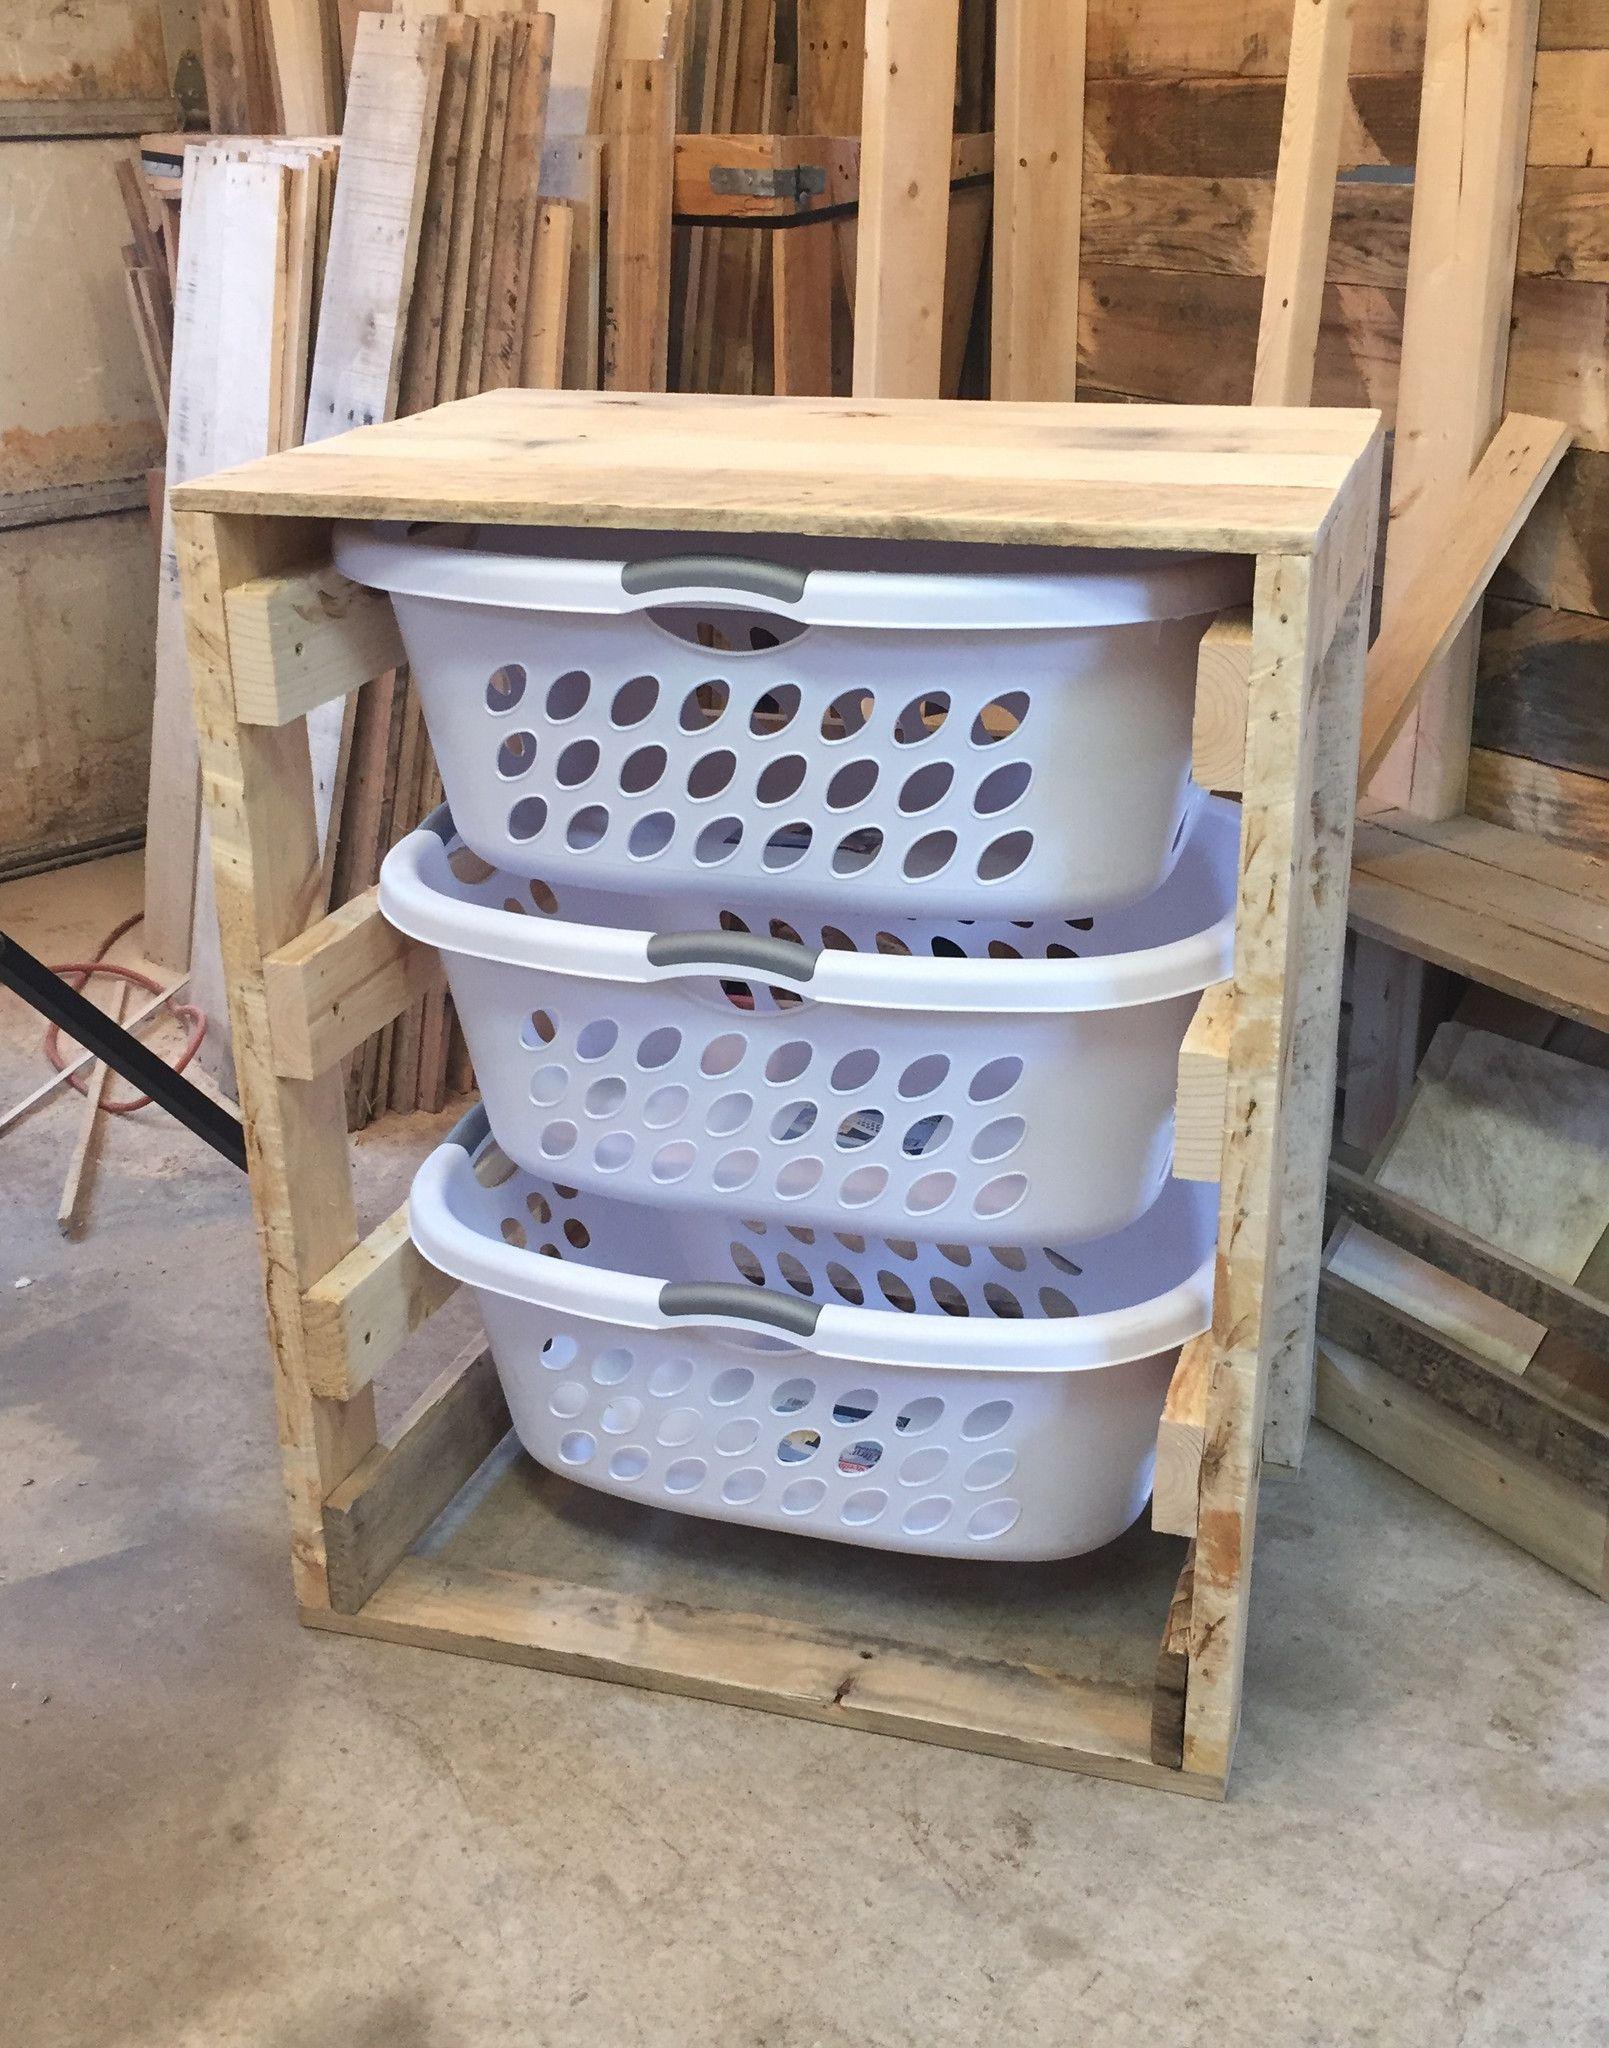 Toy Storage With Drawers Toystorageideas Toystoragedecor Laundry Basket Dresser Diy Laundry Laundry Room Organization